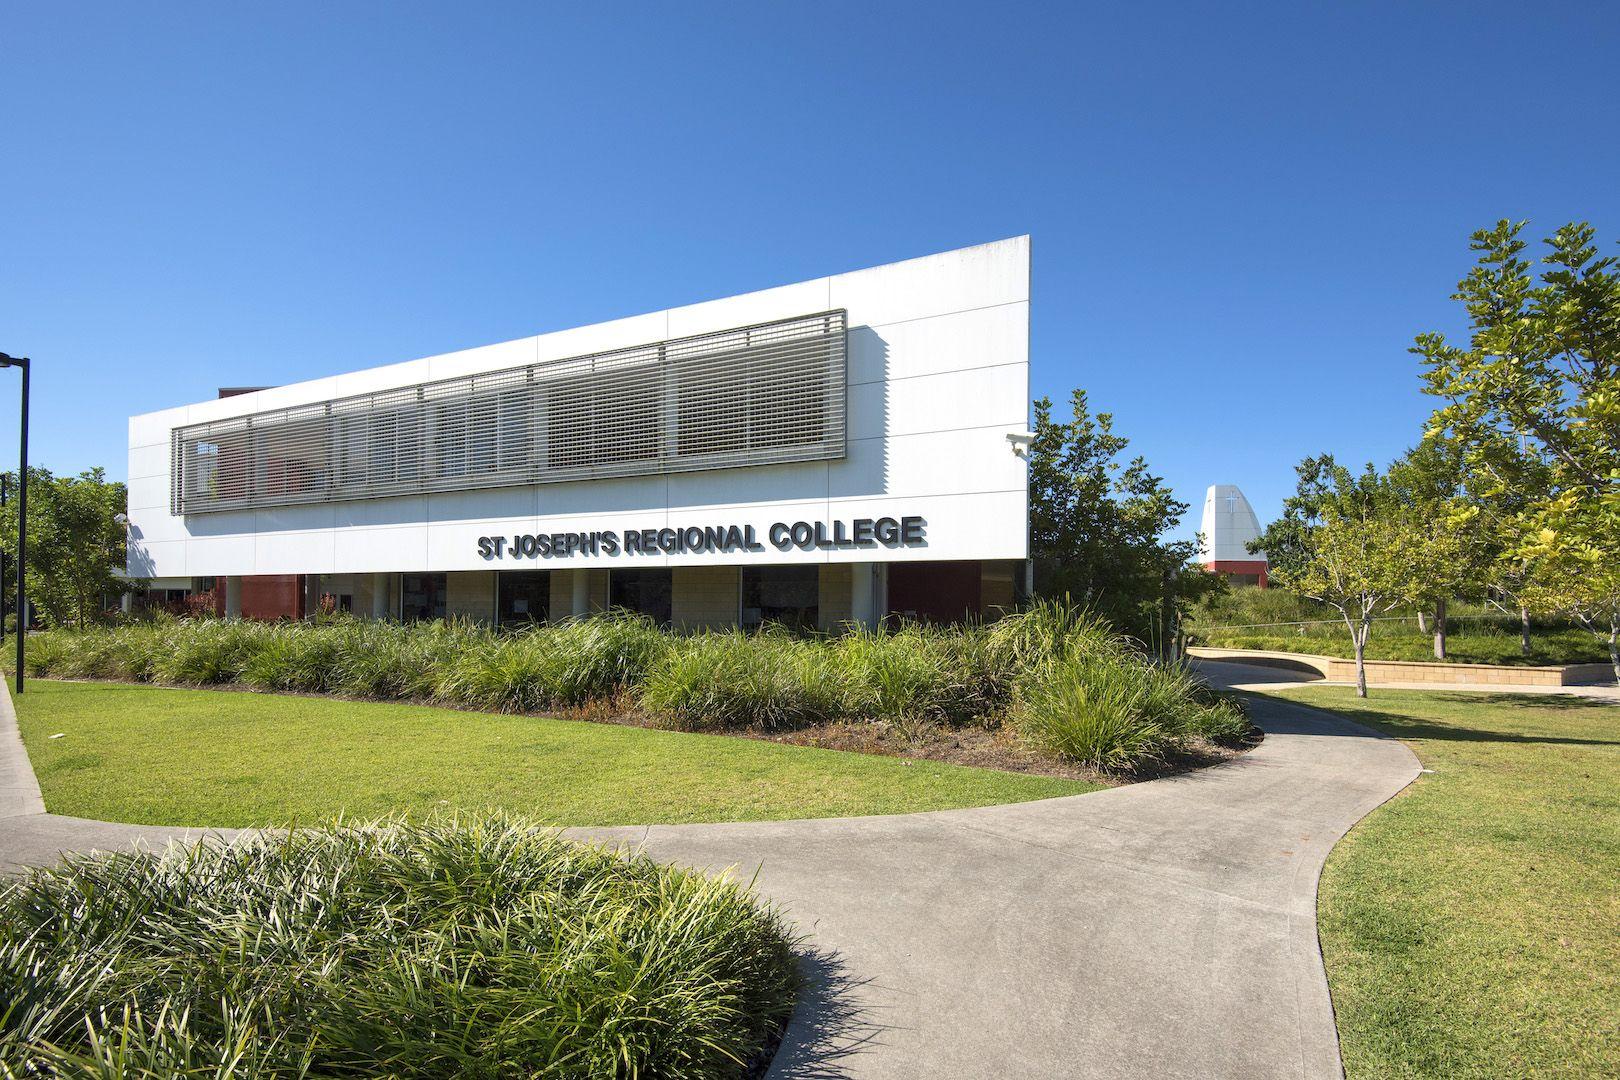 Lot 8 Seminar Street, College Rise, Port Macquarie NSW 2444, Image 0